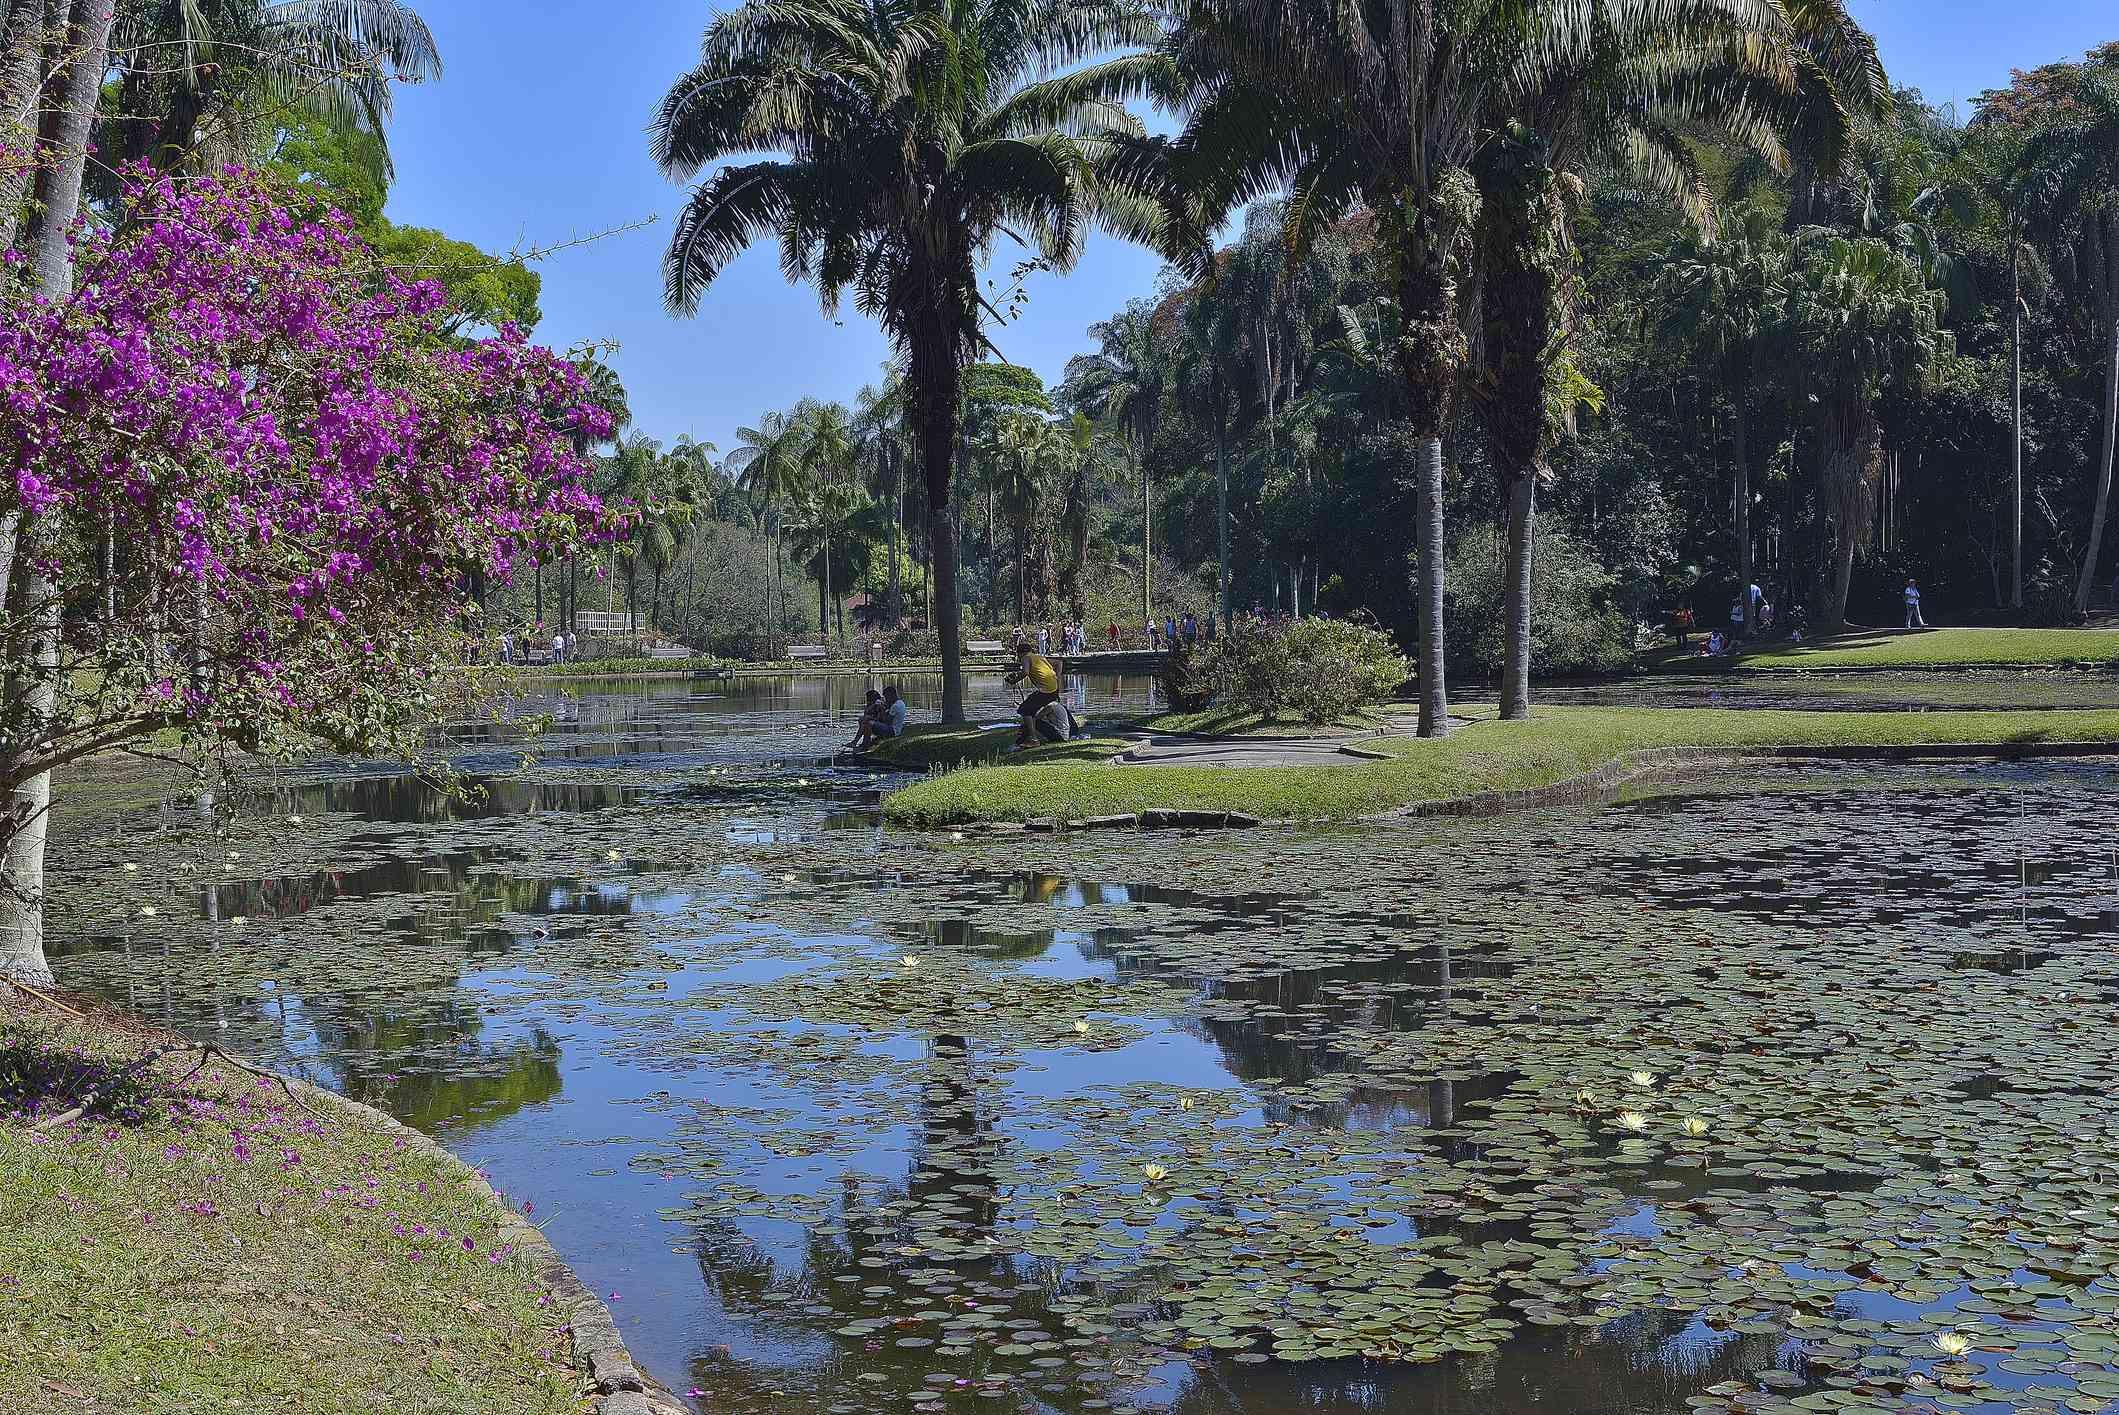 Lake in Sao Paulo Botanic Garden.